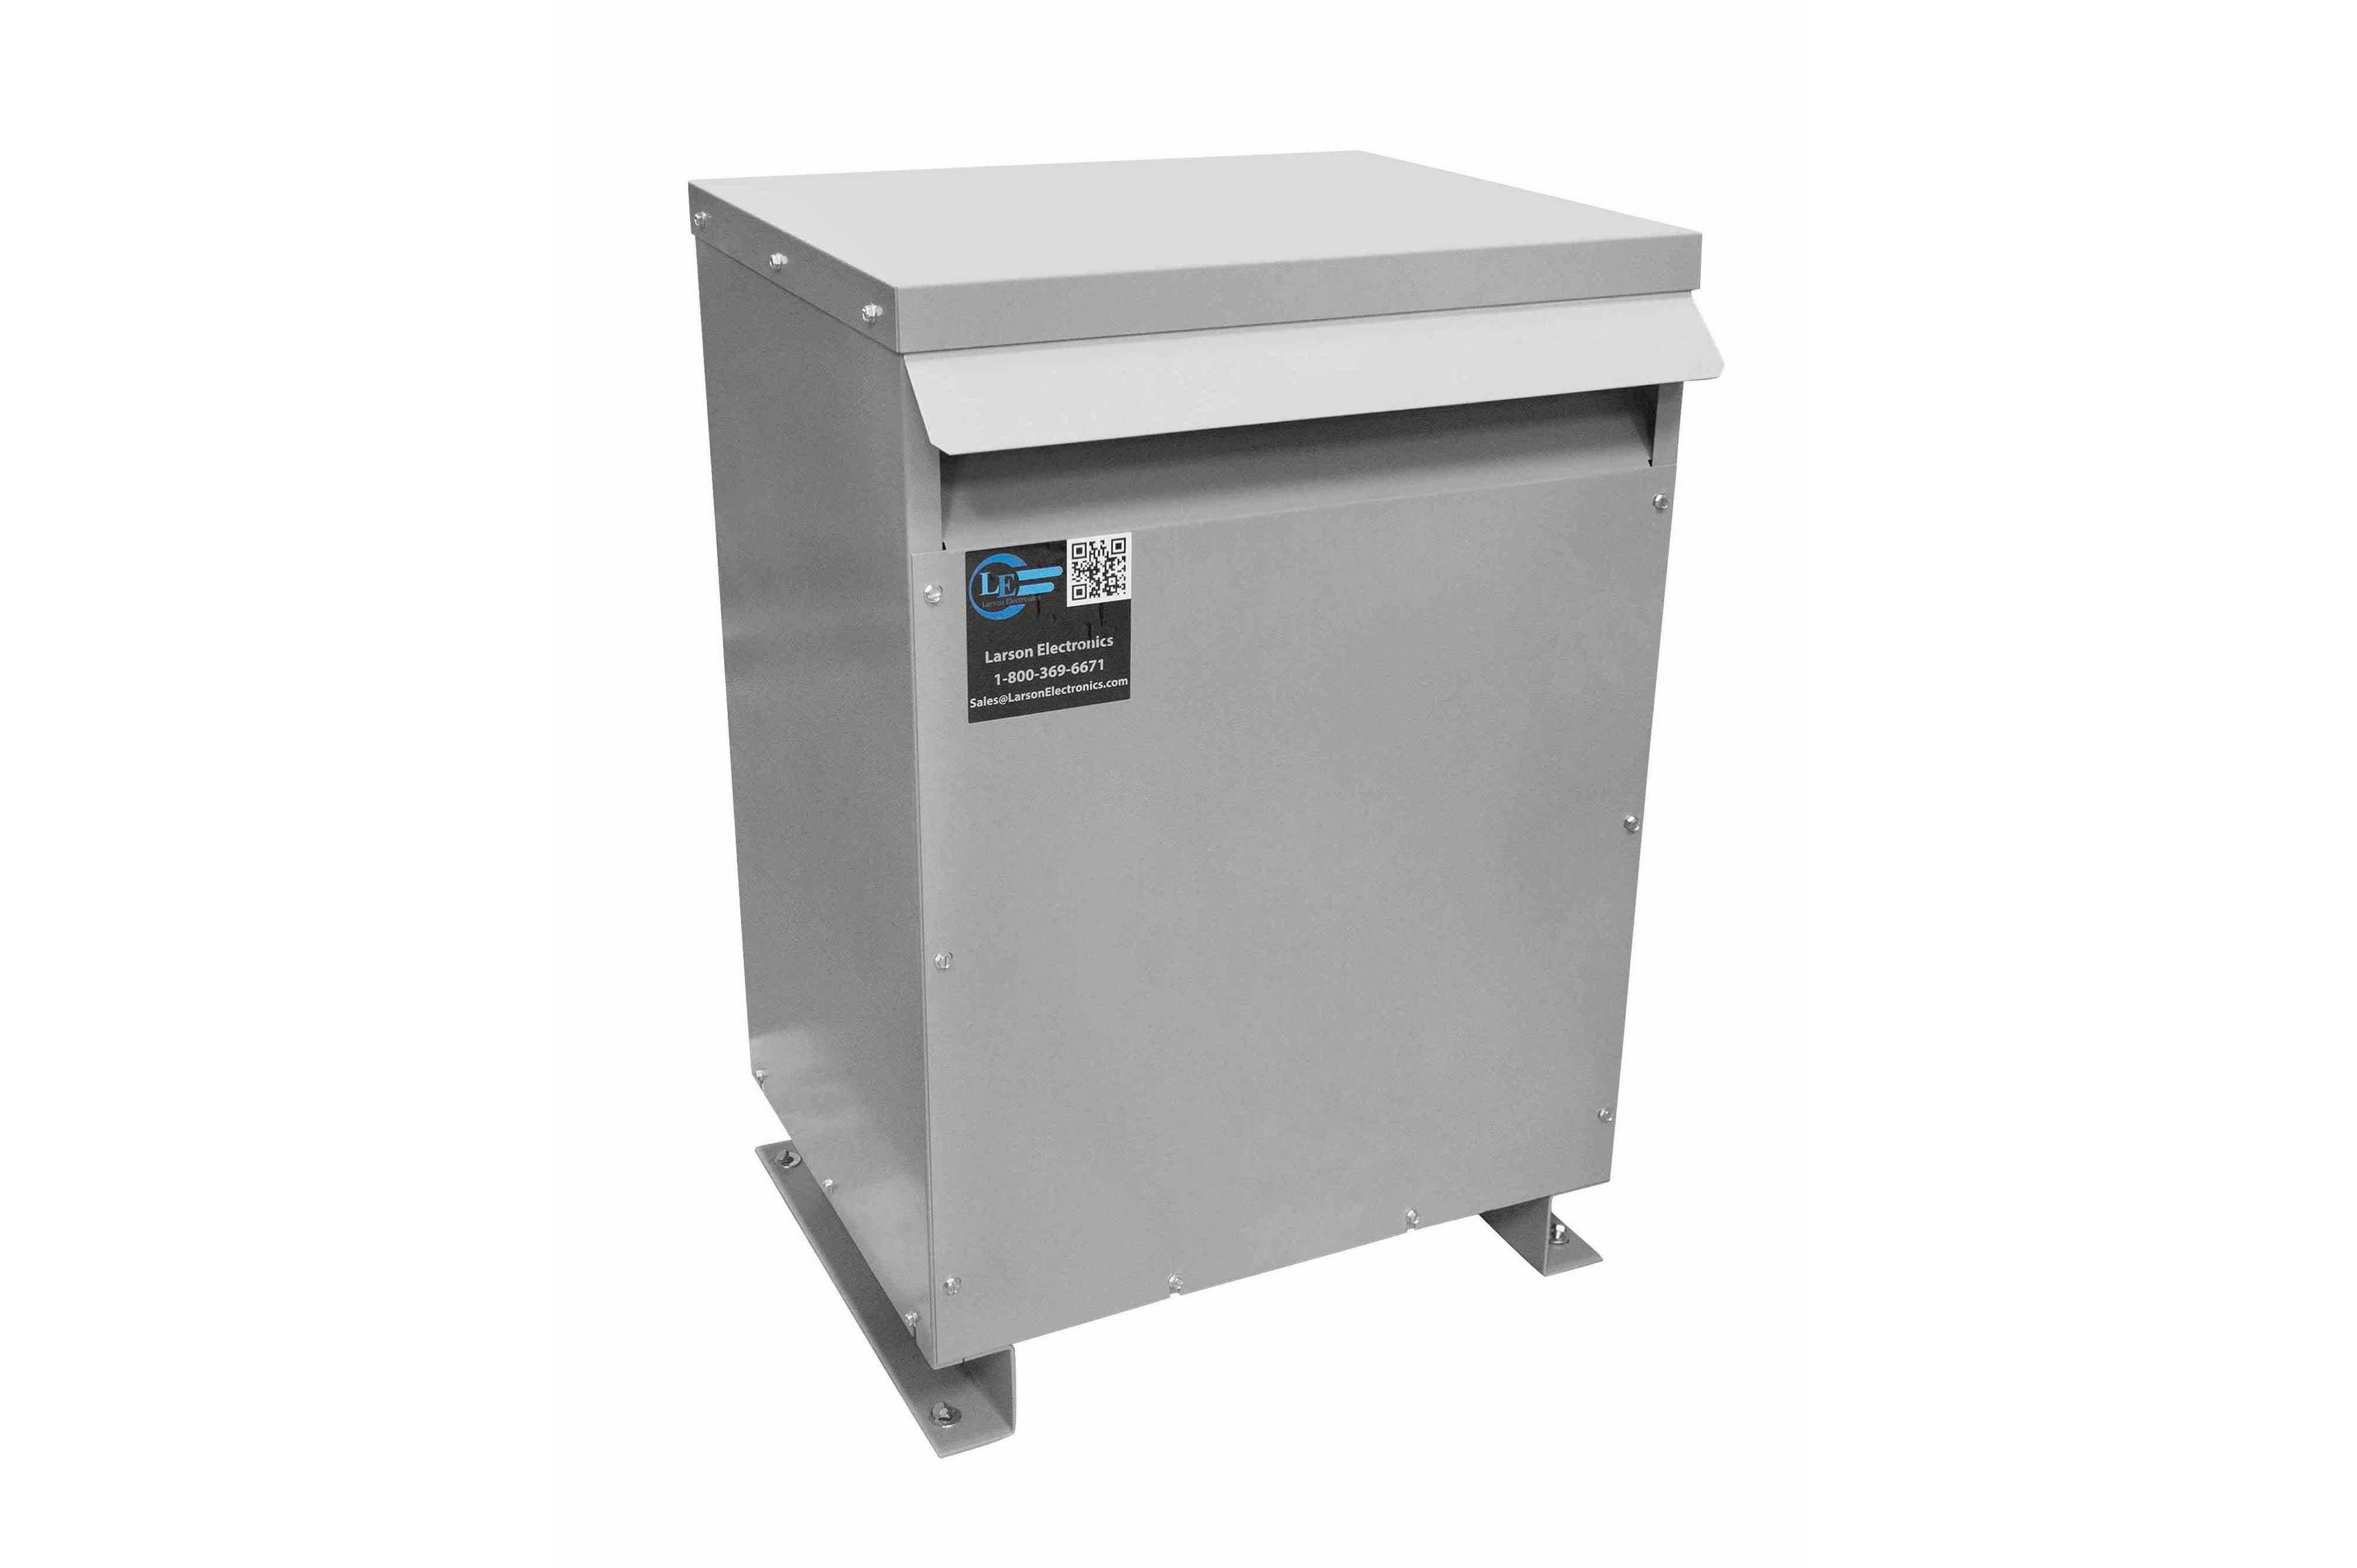 45 kVA 3PH Isolation Transformer, 380V Wye Primary, 480V Delta Secondary, N3R, Ventilated, 60 Hz